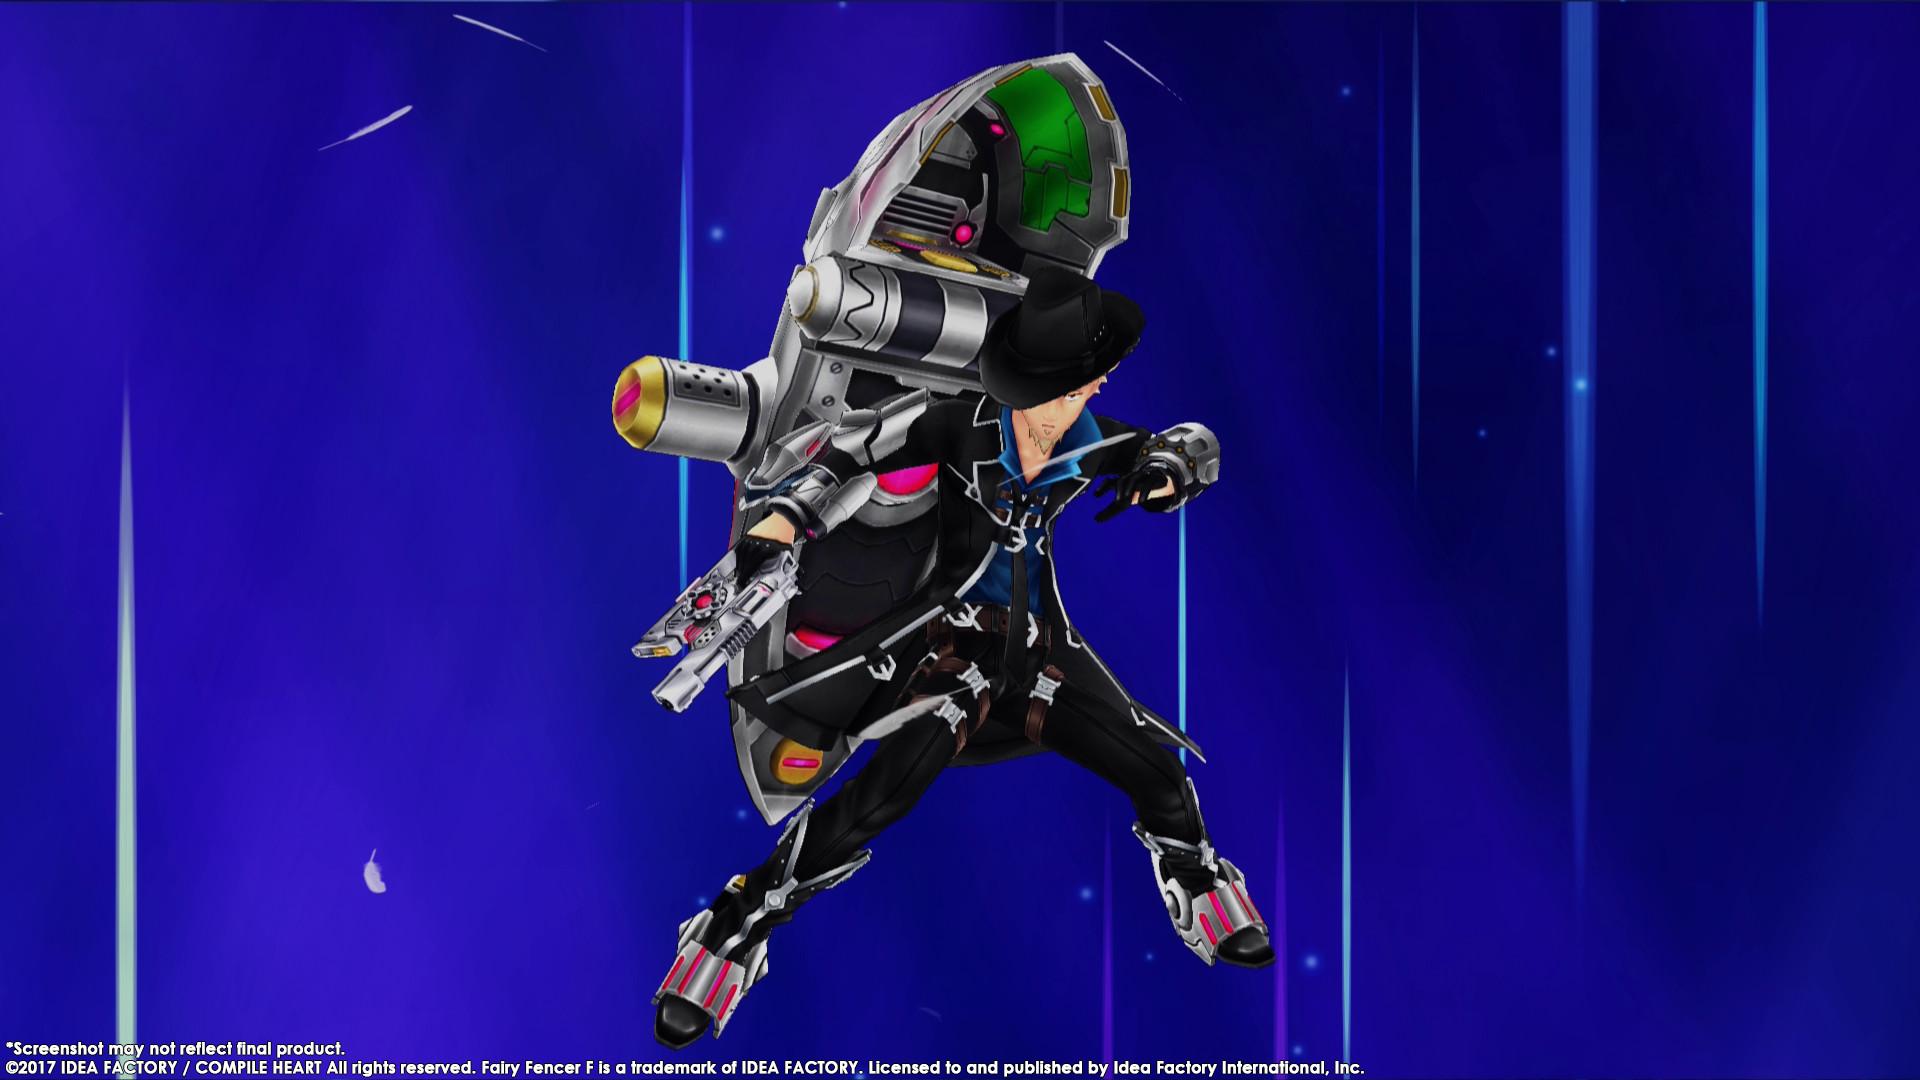 KHAiHOM.com - Fairy Fencer F Advent Dark Force | フェアリーフェンサー エフ ADVENT DARK FORCE | 妖精劍士 F ADVENT DARK FORCE